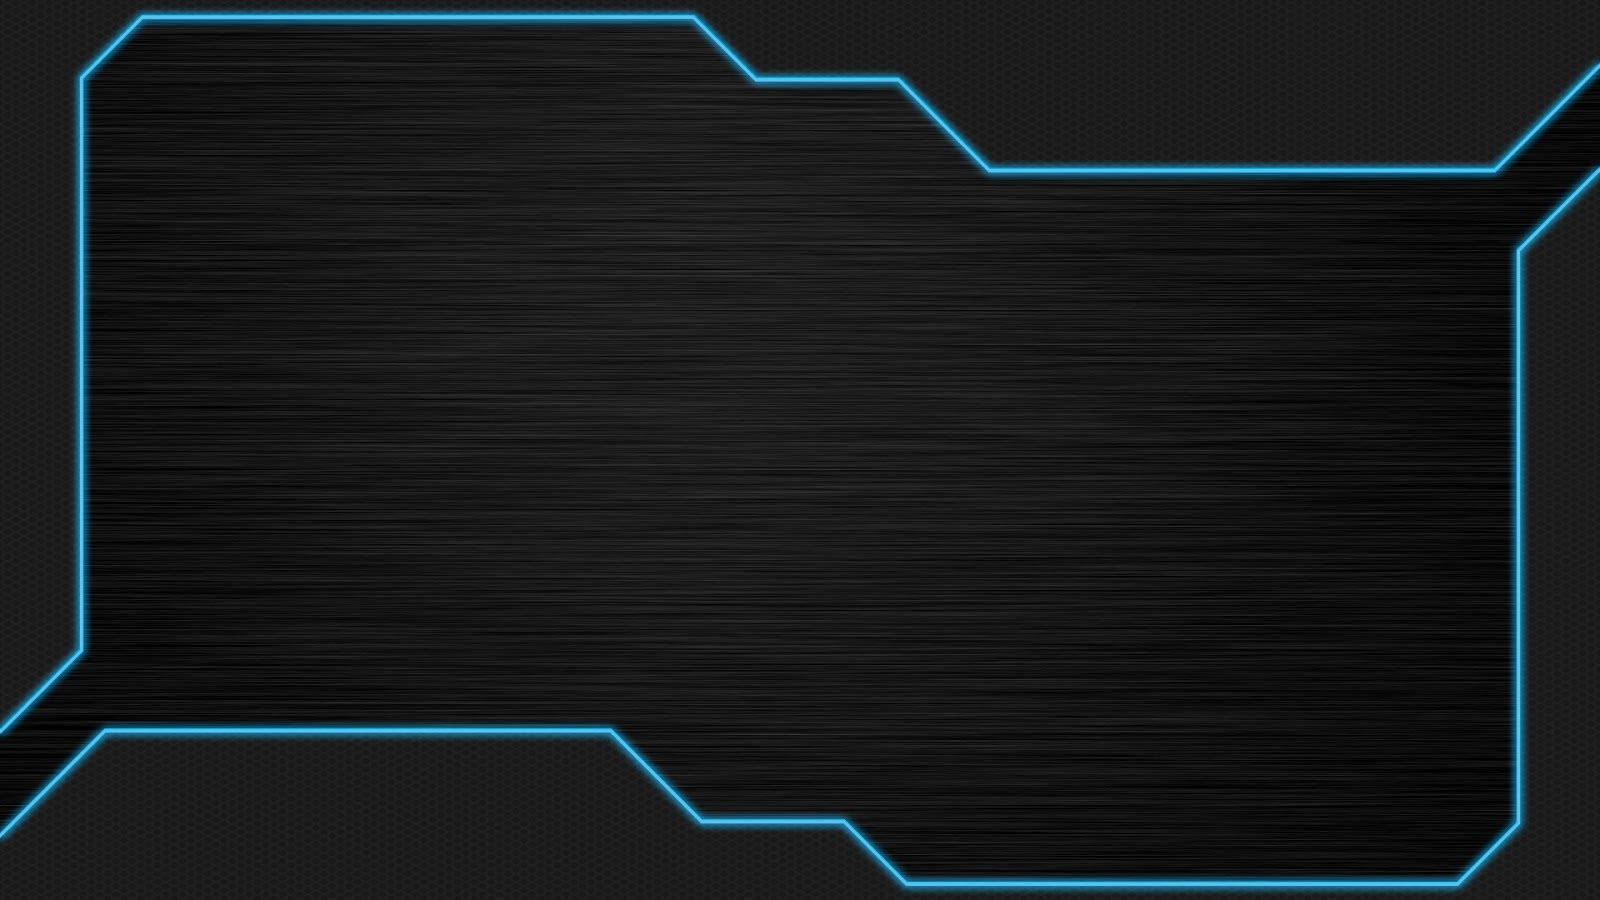 futuristic machine graphic overlay - HD1600×900